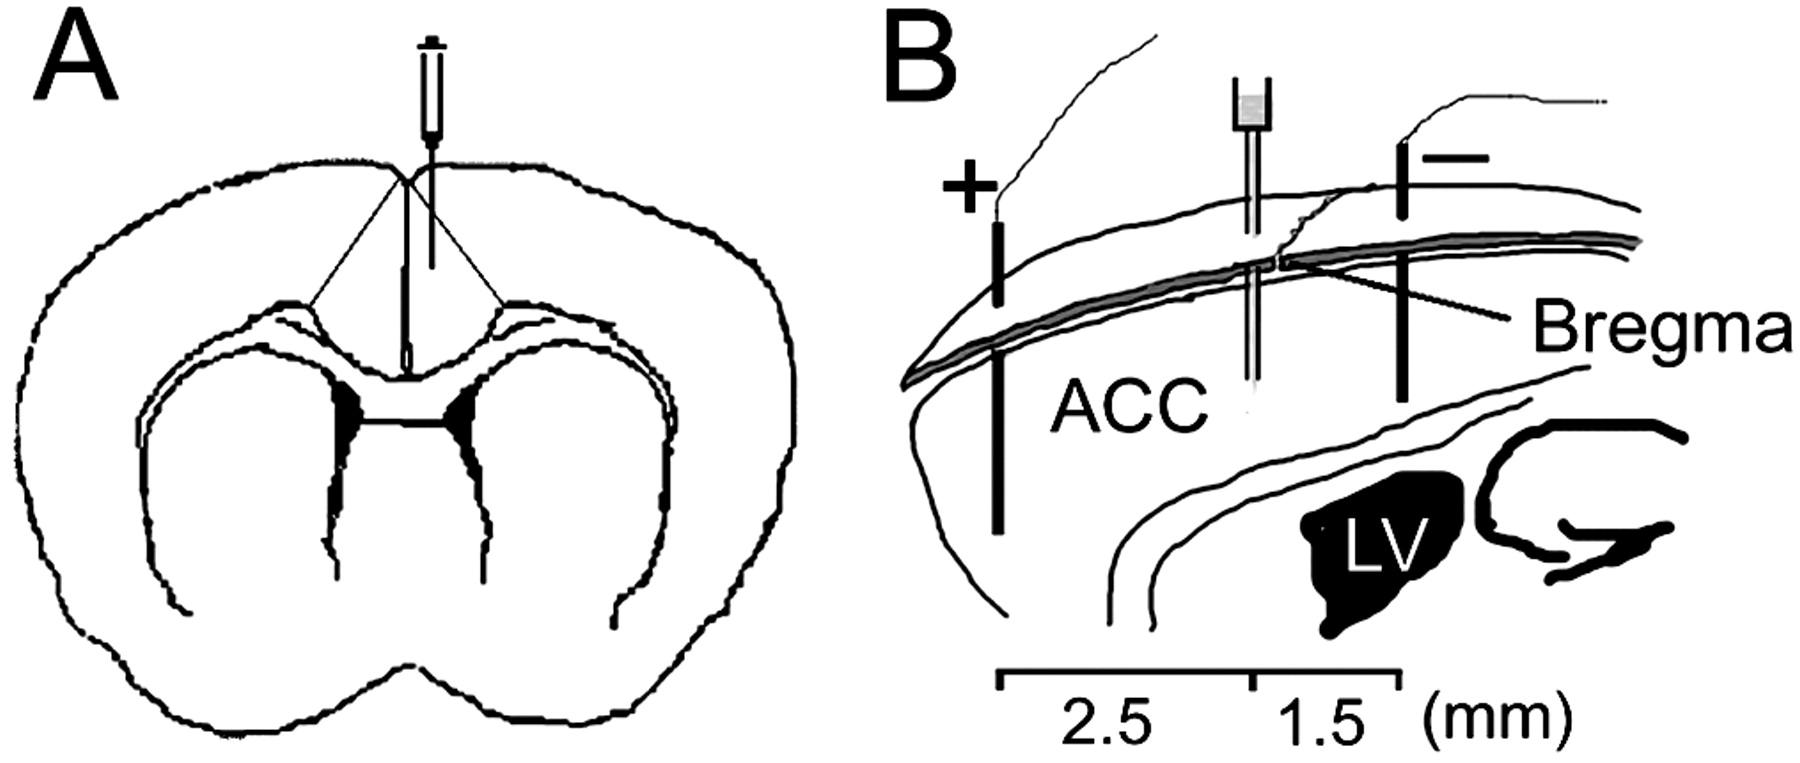 Calmodulin Regulates Synaptic Plasticity In The Anterior Cingulate